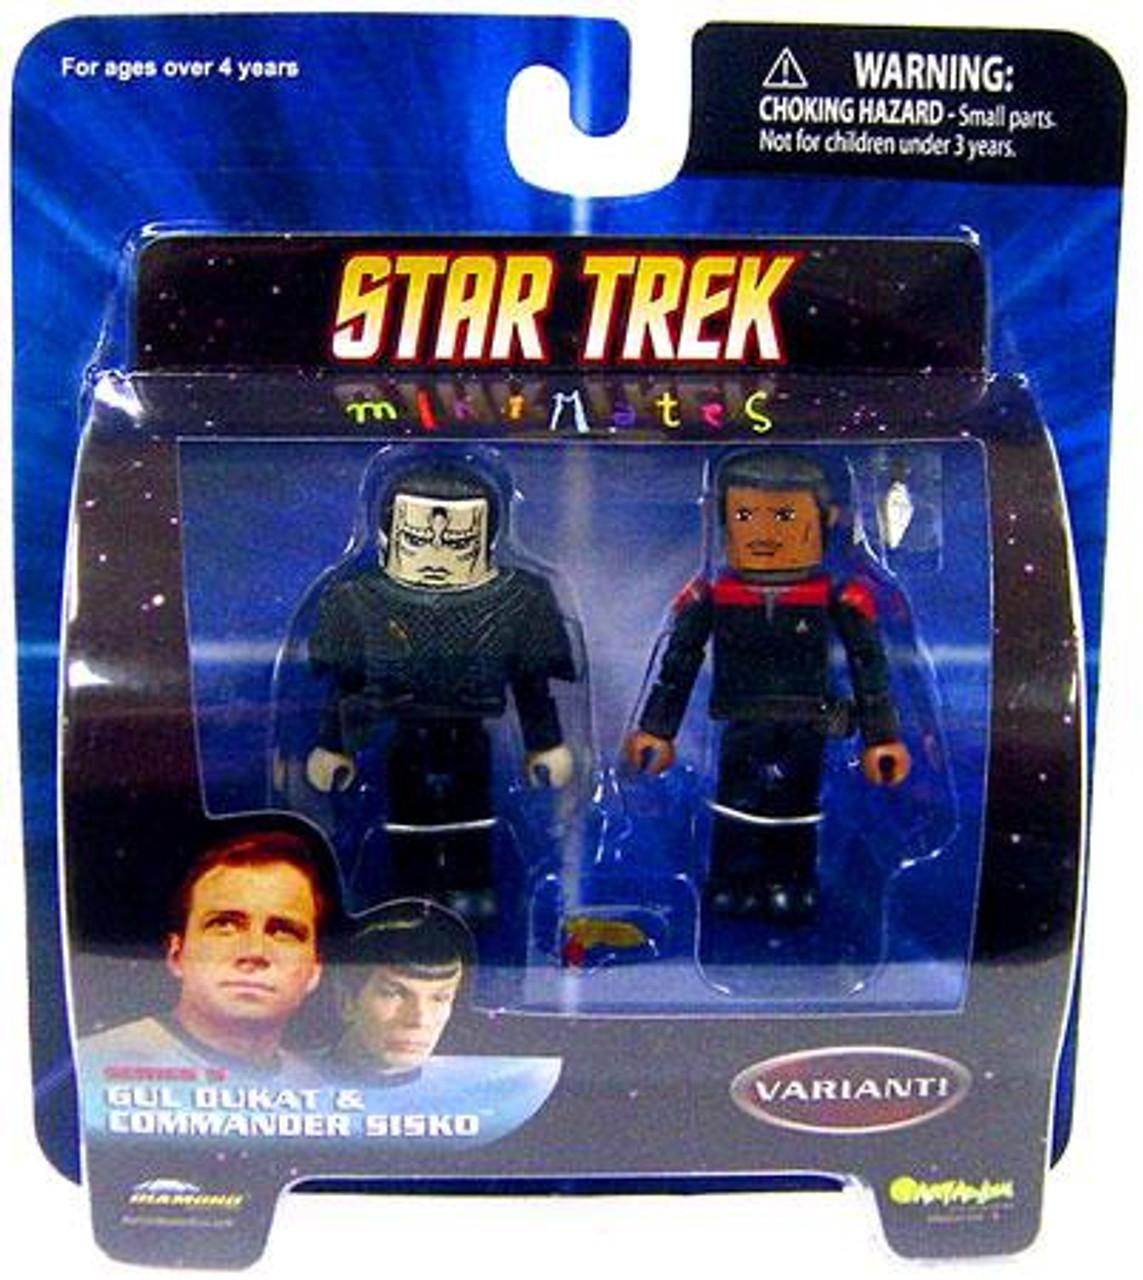 Star Trek Deep Space 9 MiniMates Series 5 Gul Dukat & Commander Sisko Minifigure 2-Pack [Variant]